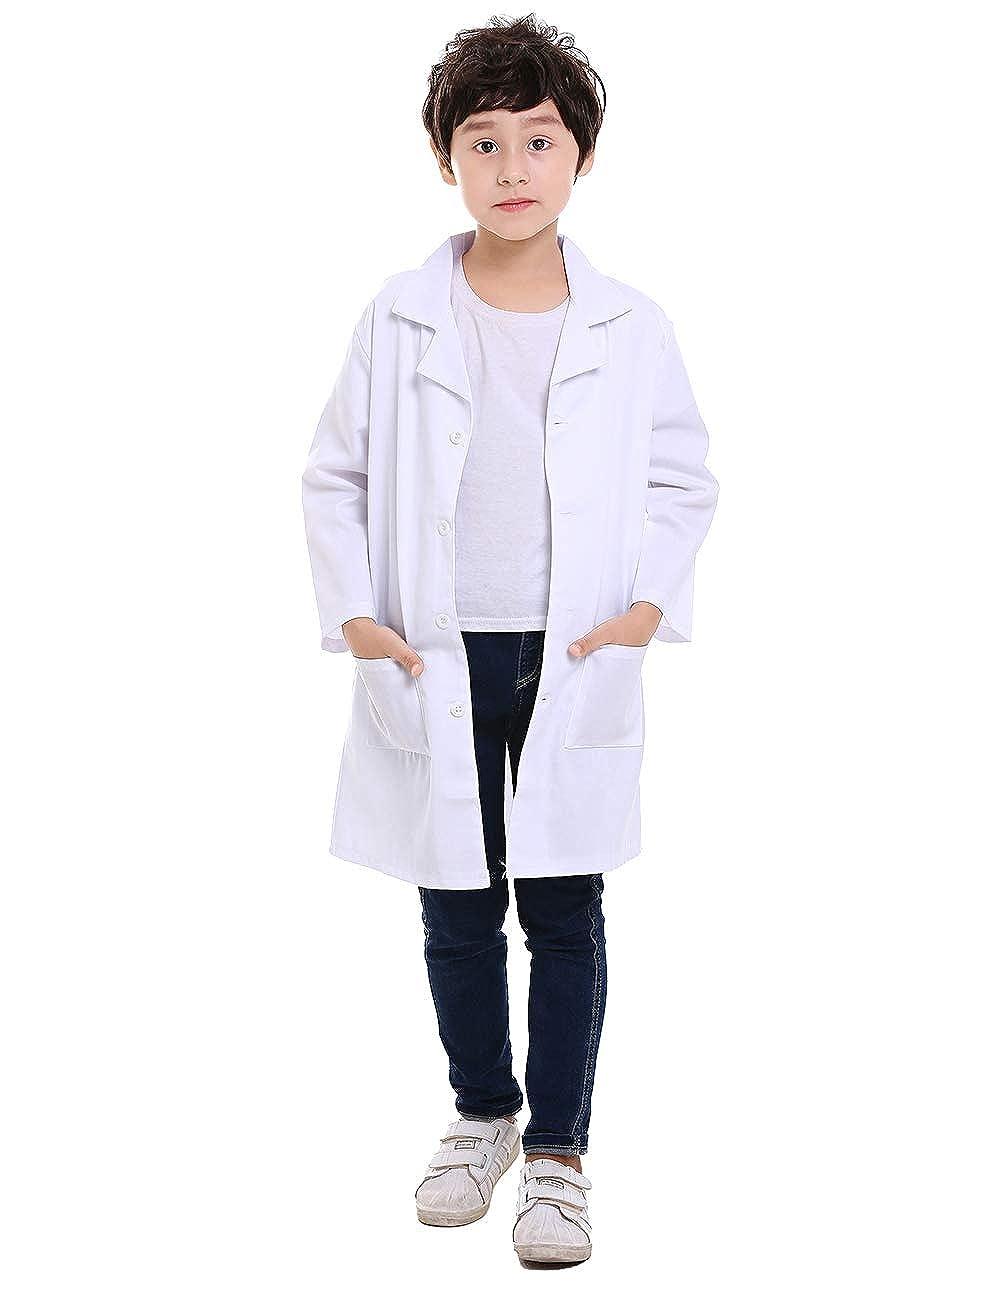 COTTON KIDS BOYS CHILDREN WHITE LAB COAT JACKET DOCTOR MEDICAL SCHOOL SHOWS